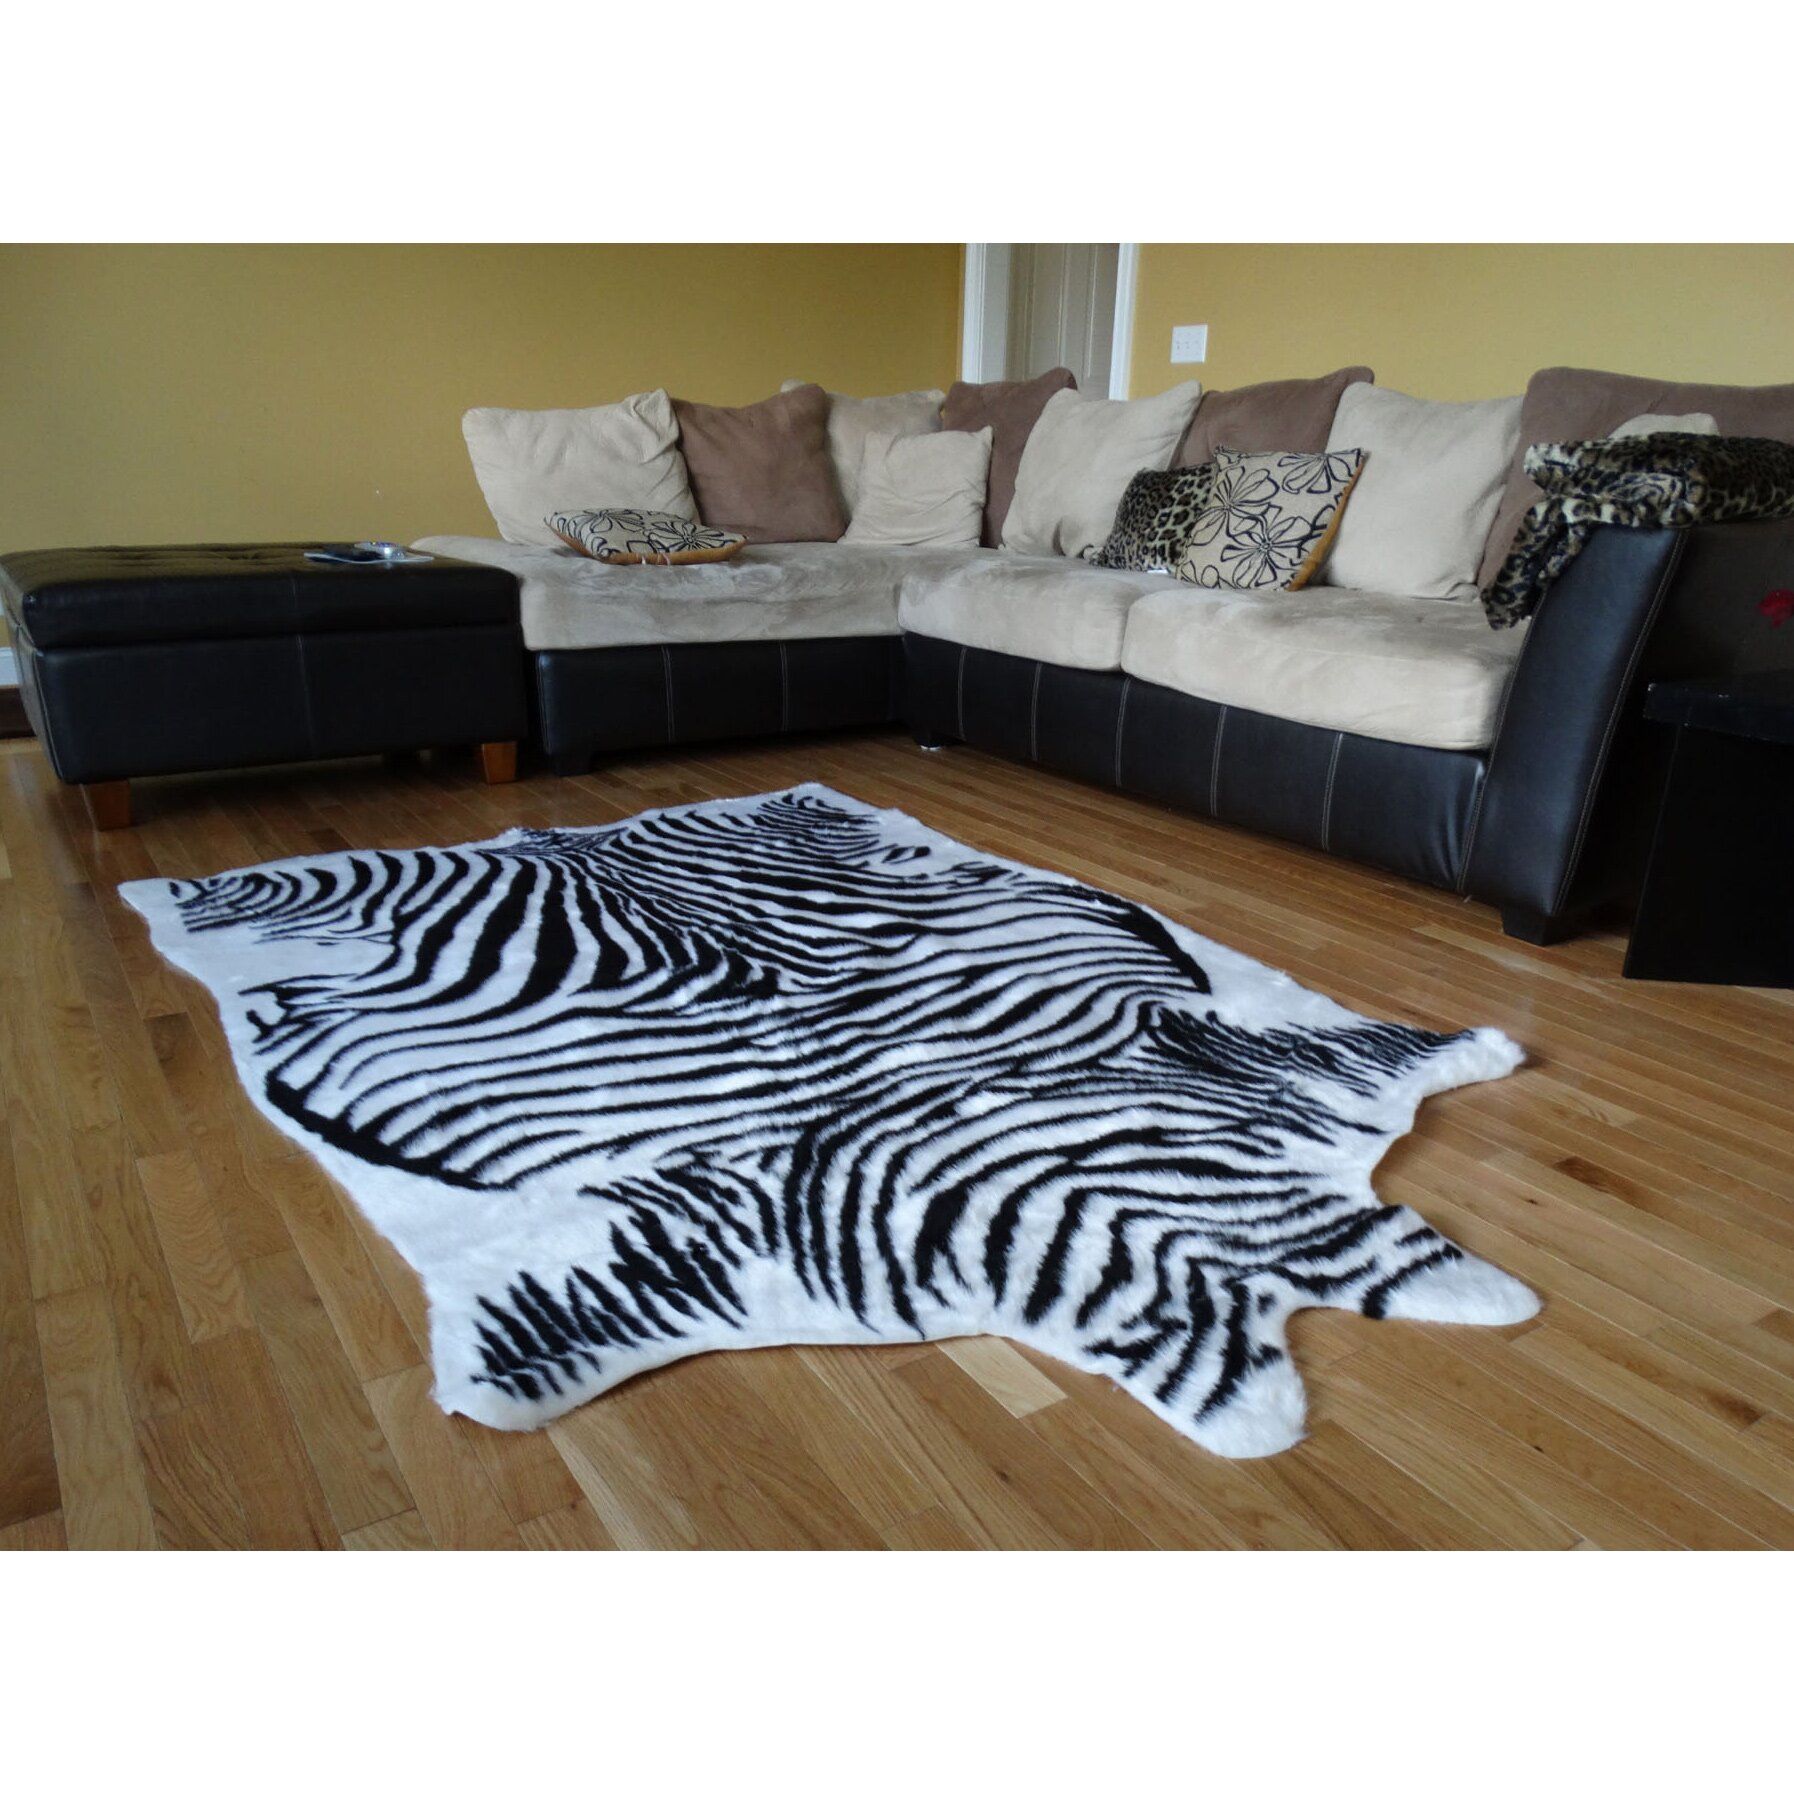 Acura Rugs Animal Hide White/Black Zebra Area Rug